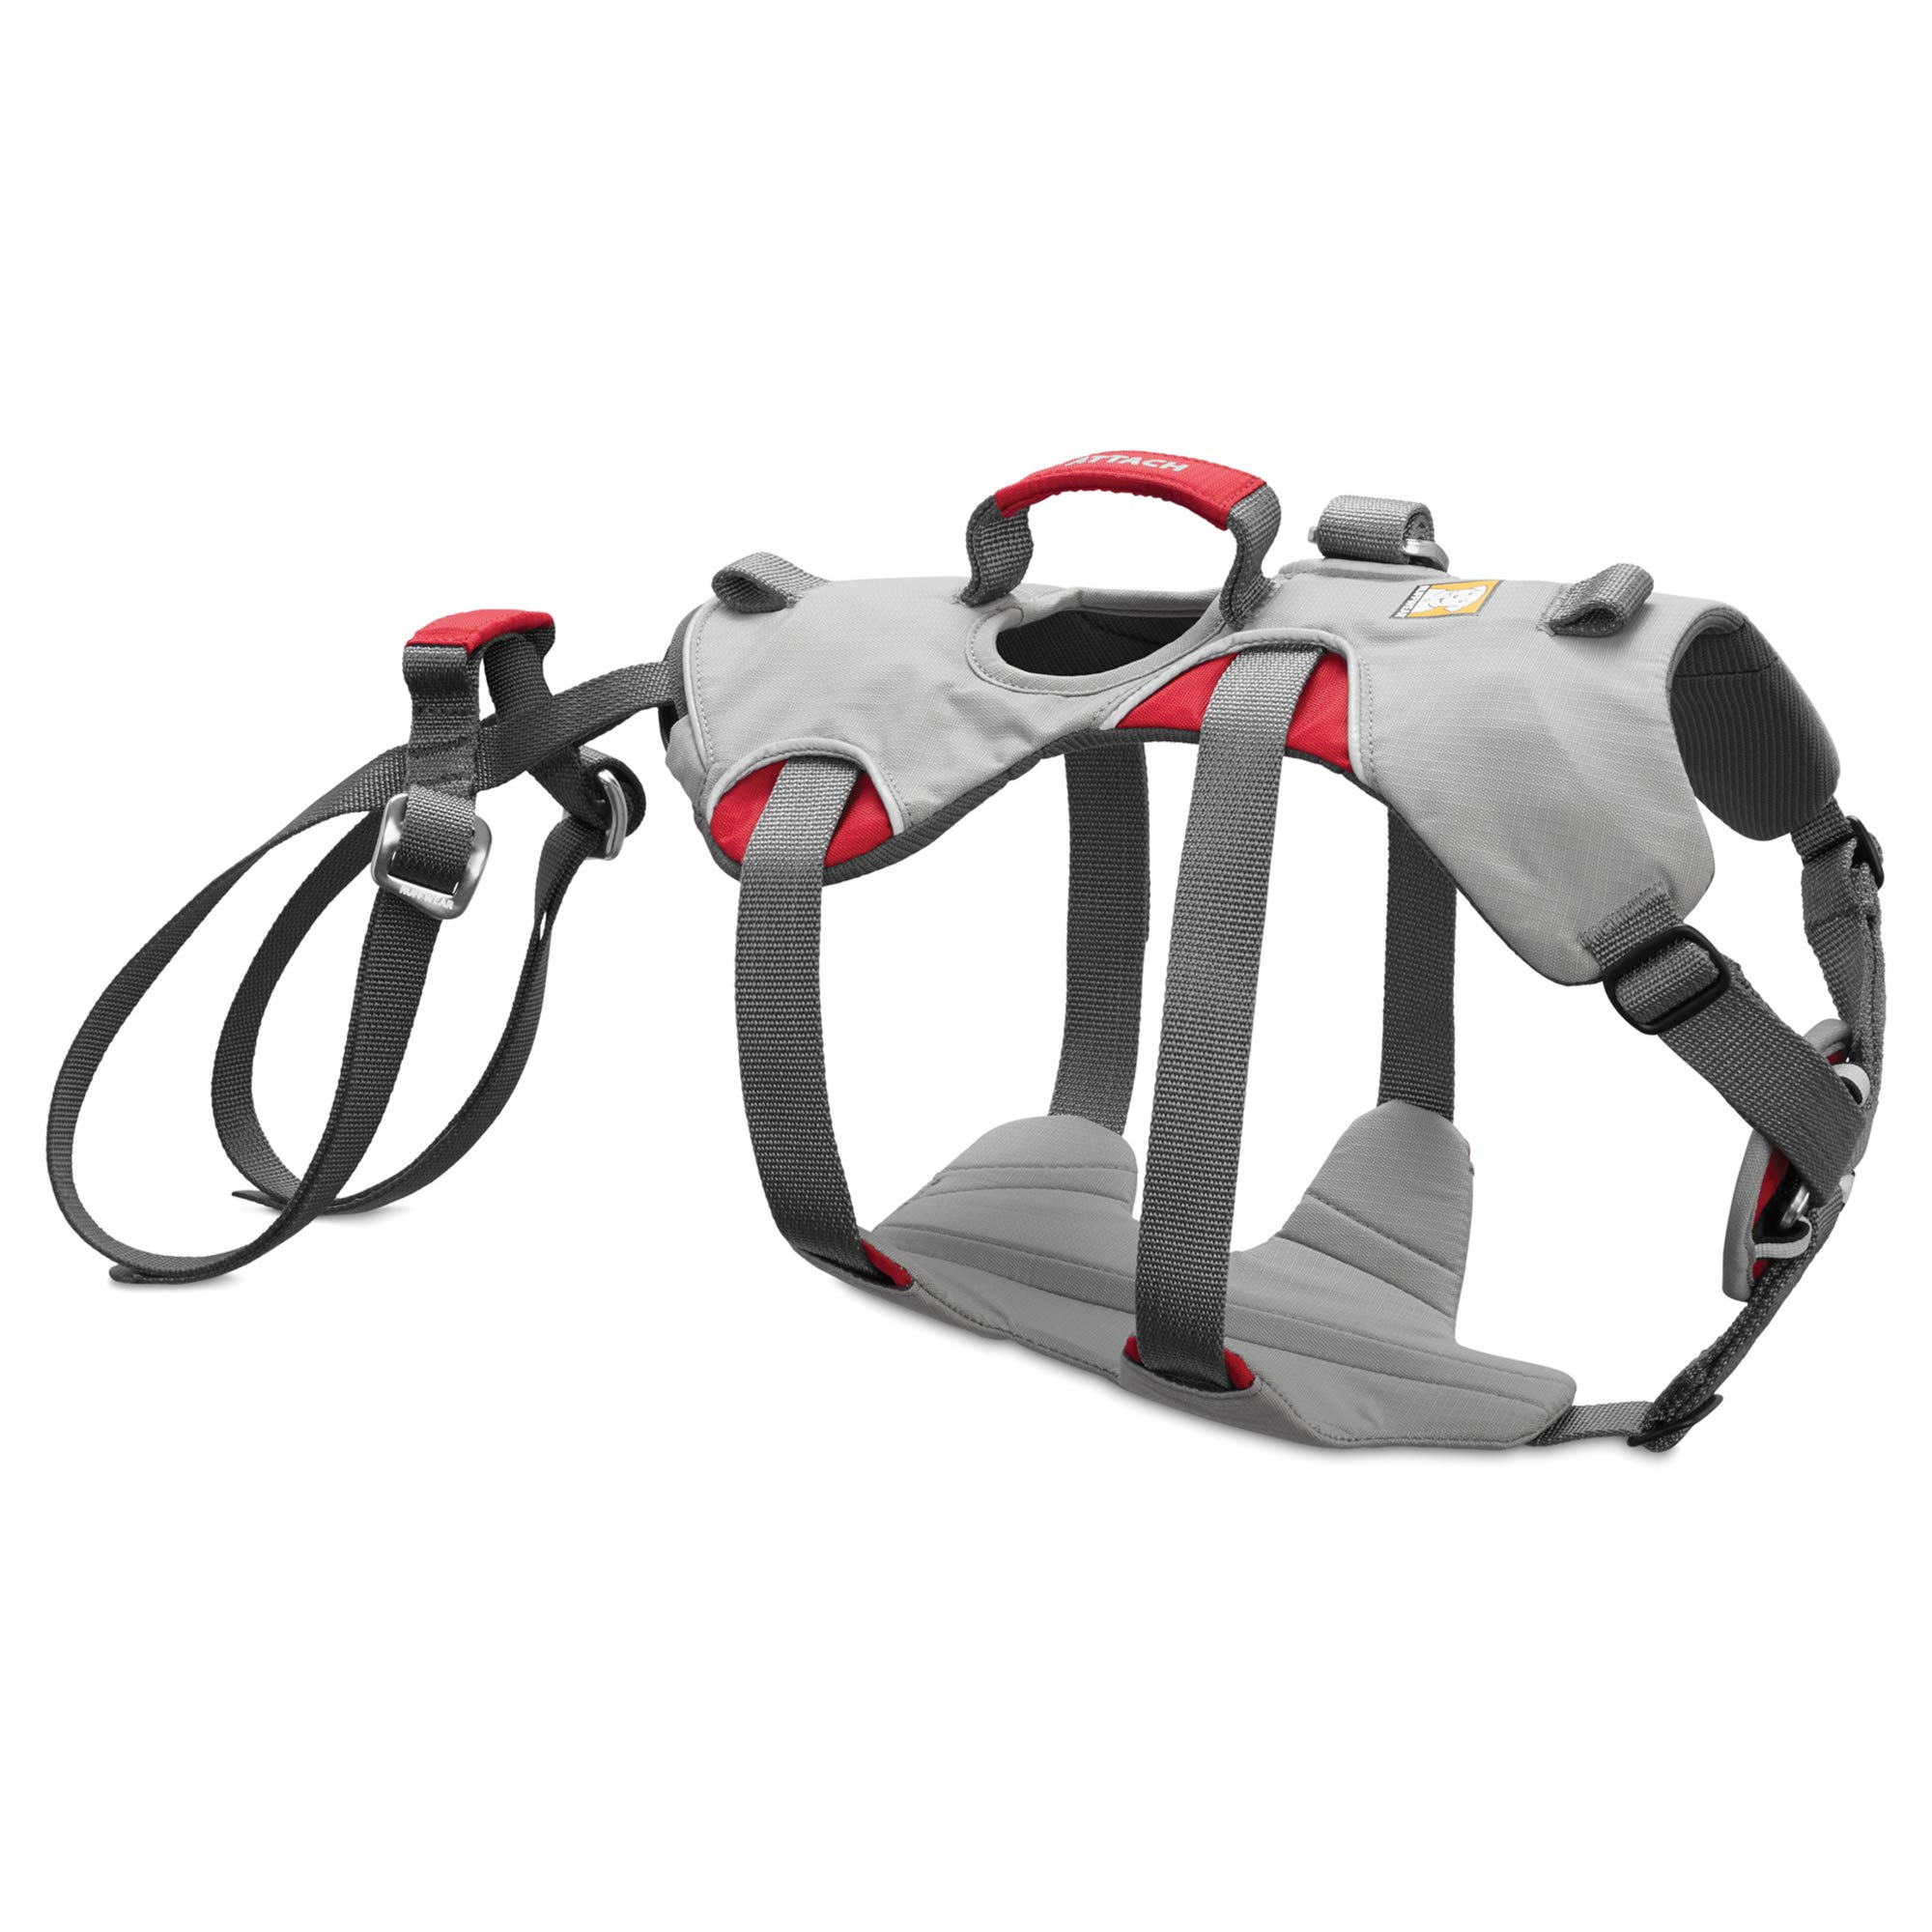 RUFFWEAR - Doubleback, Strength-Rated Belay Dog Harness, Rock Climbing & Backpacking, Strength-Rated to 2,000 lbf/8.9 kN, Cloudburst Gray, X-Small